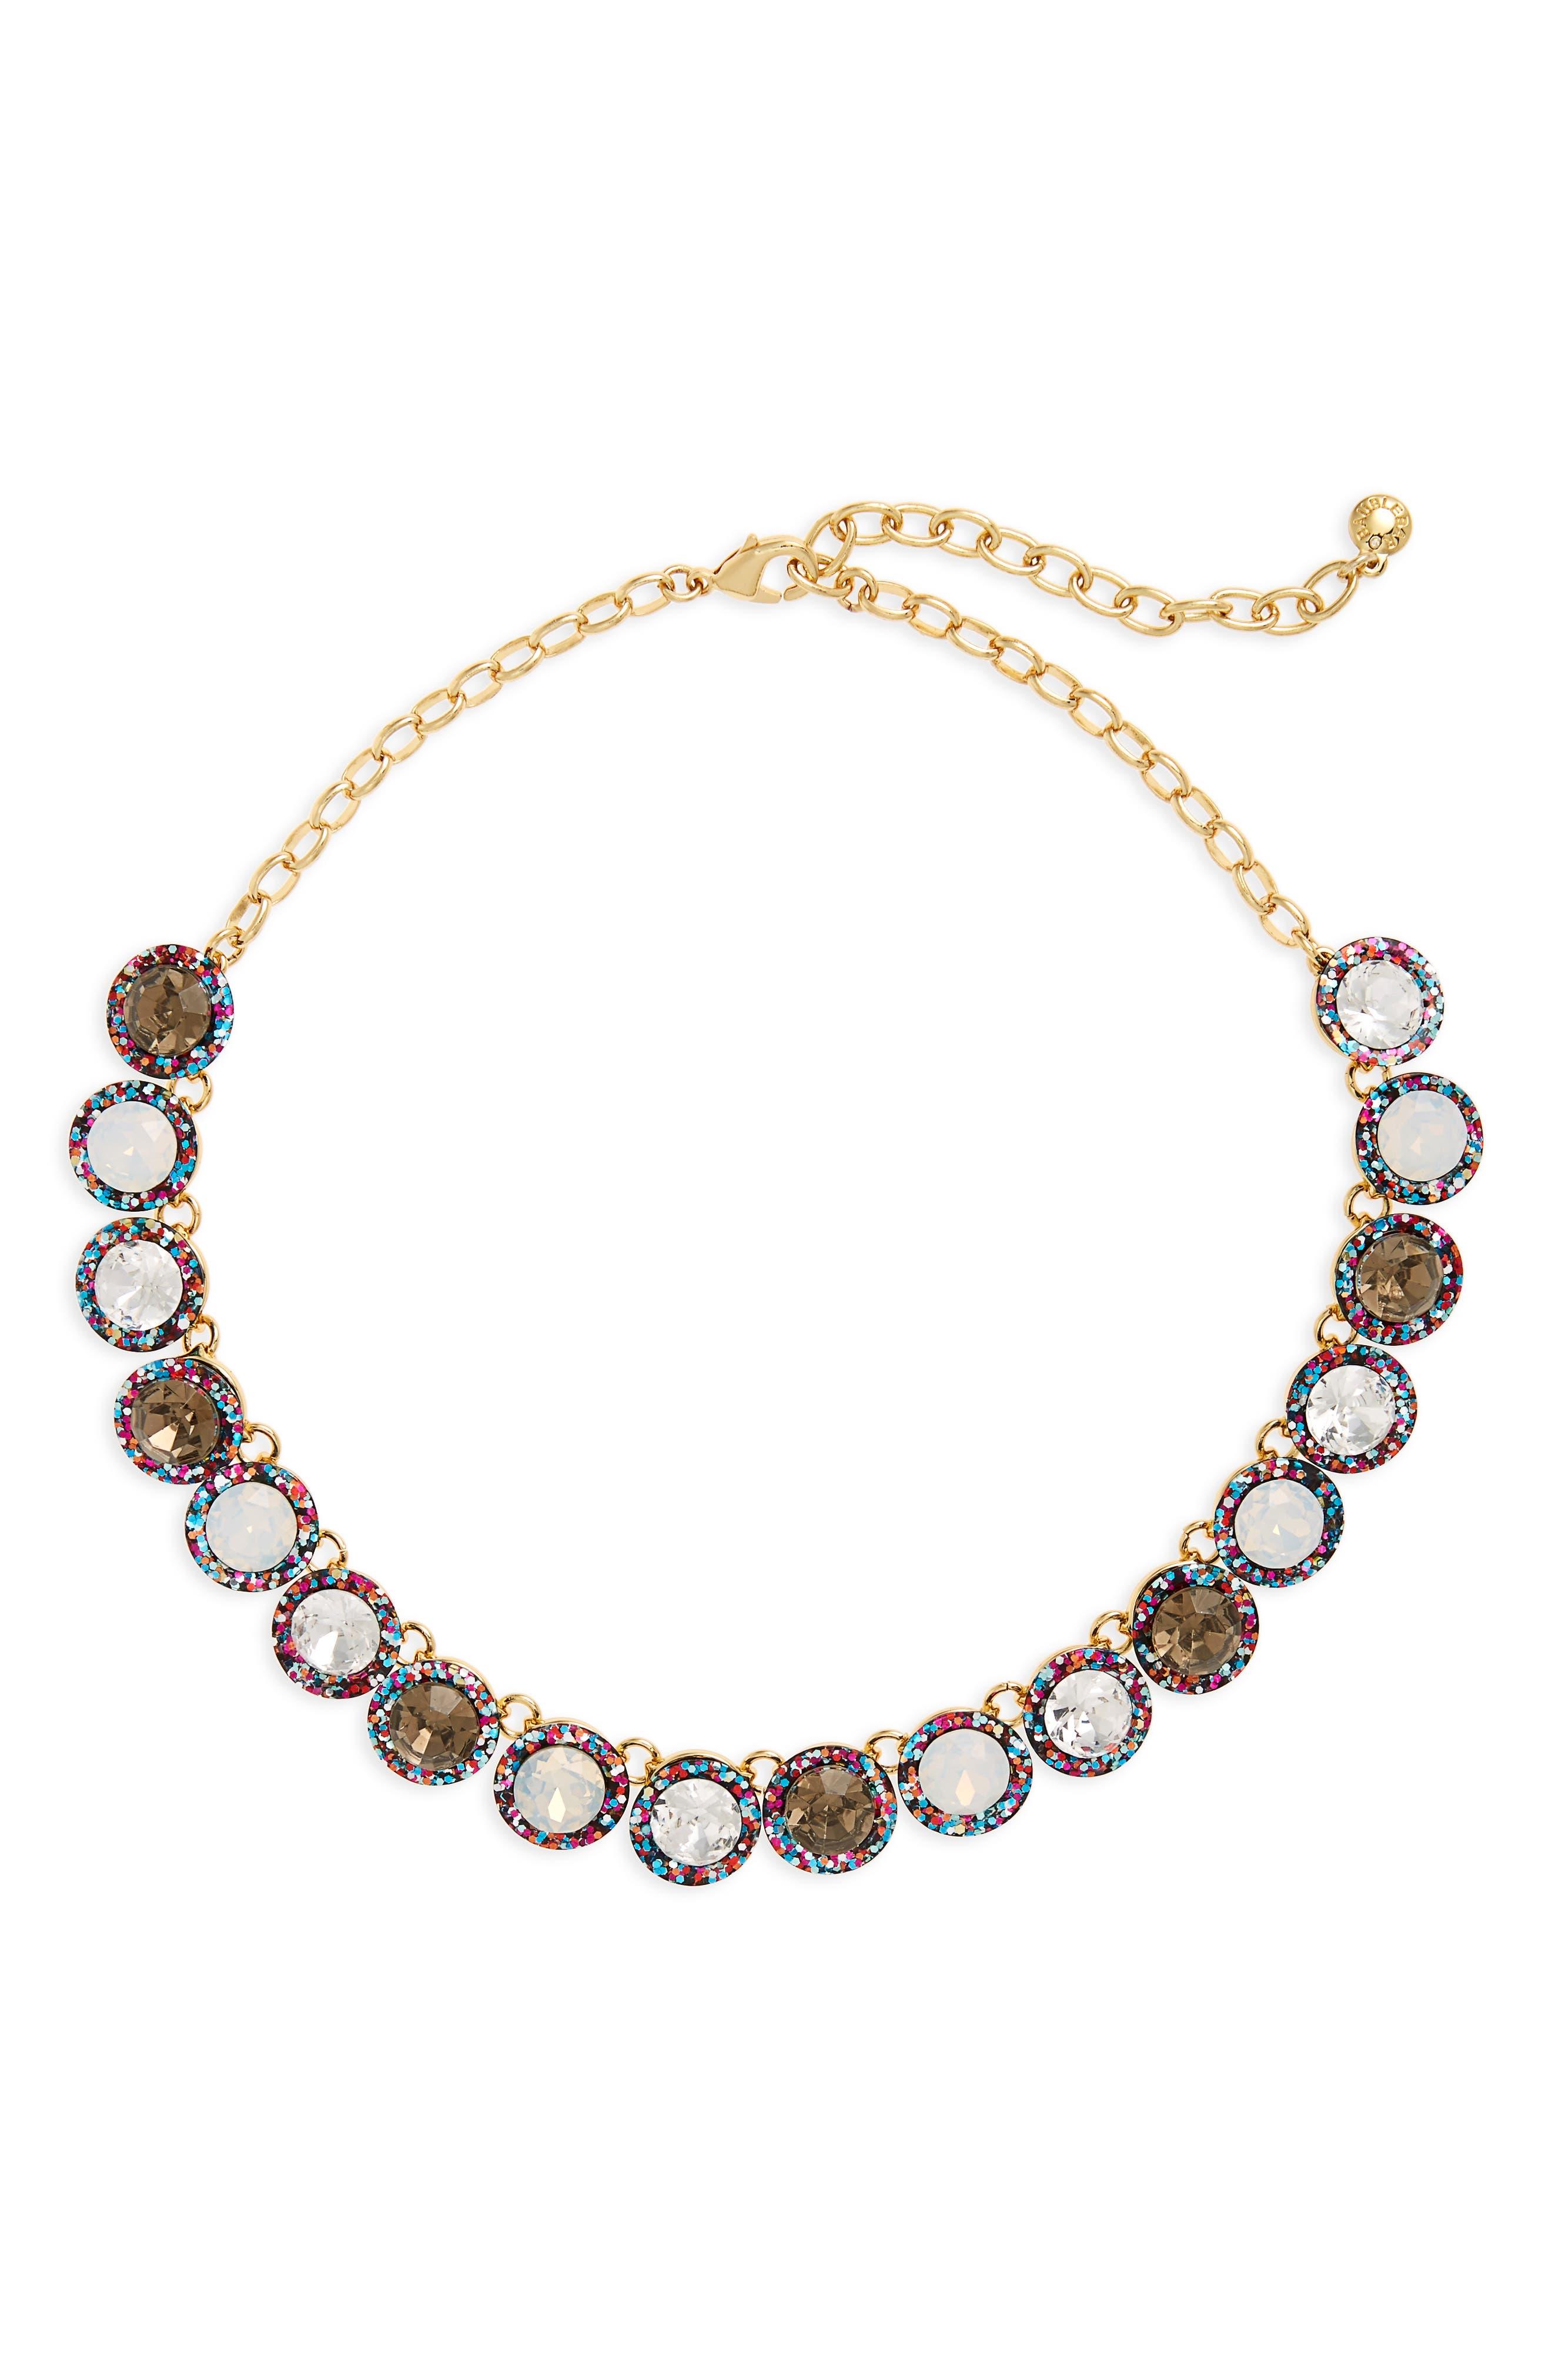 Main Image - BaubleBar Jewel Collar Necklace